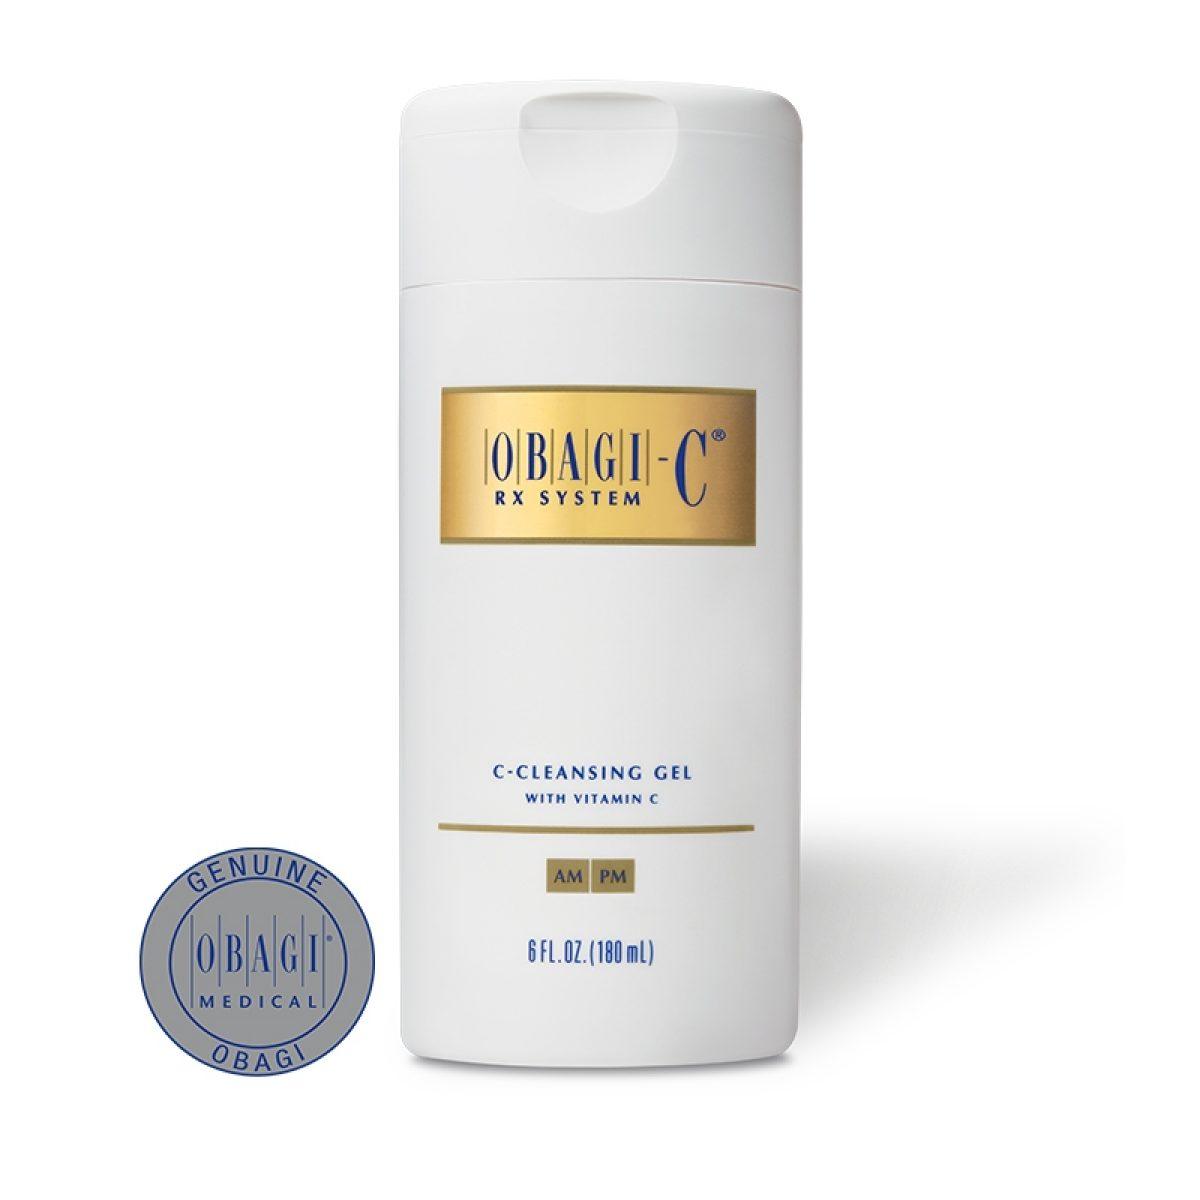 Obagi-C Cleansing Gel